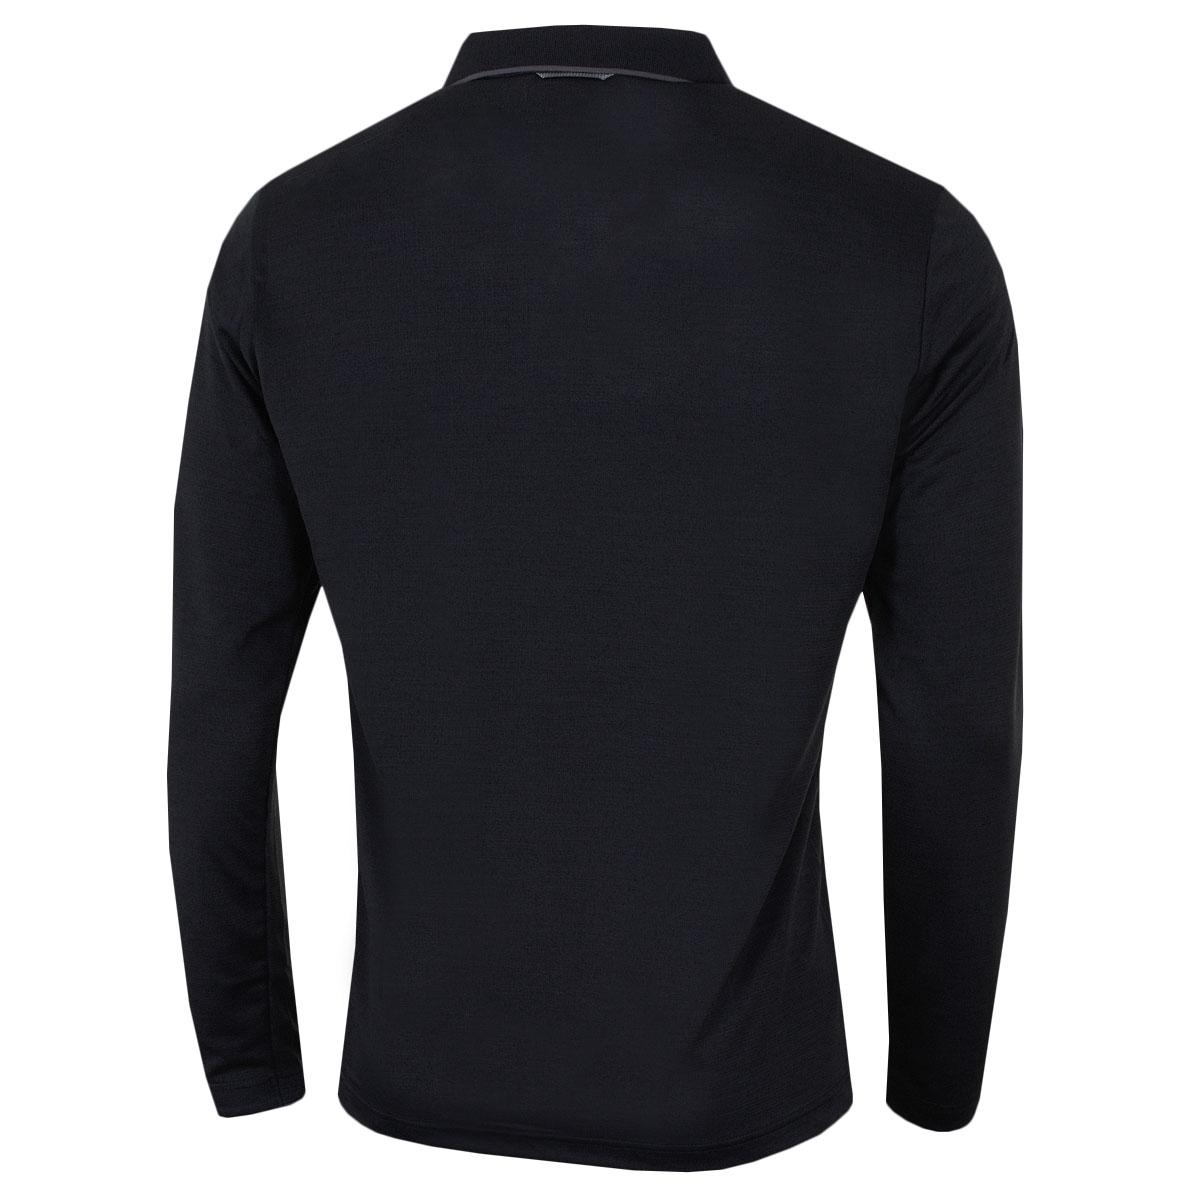 Oakley-Mens-2018-Enhance-8-7-Long-Sleeve-Quick-Drying-Polo-Shirt